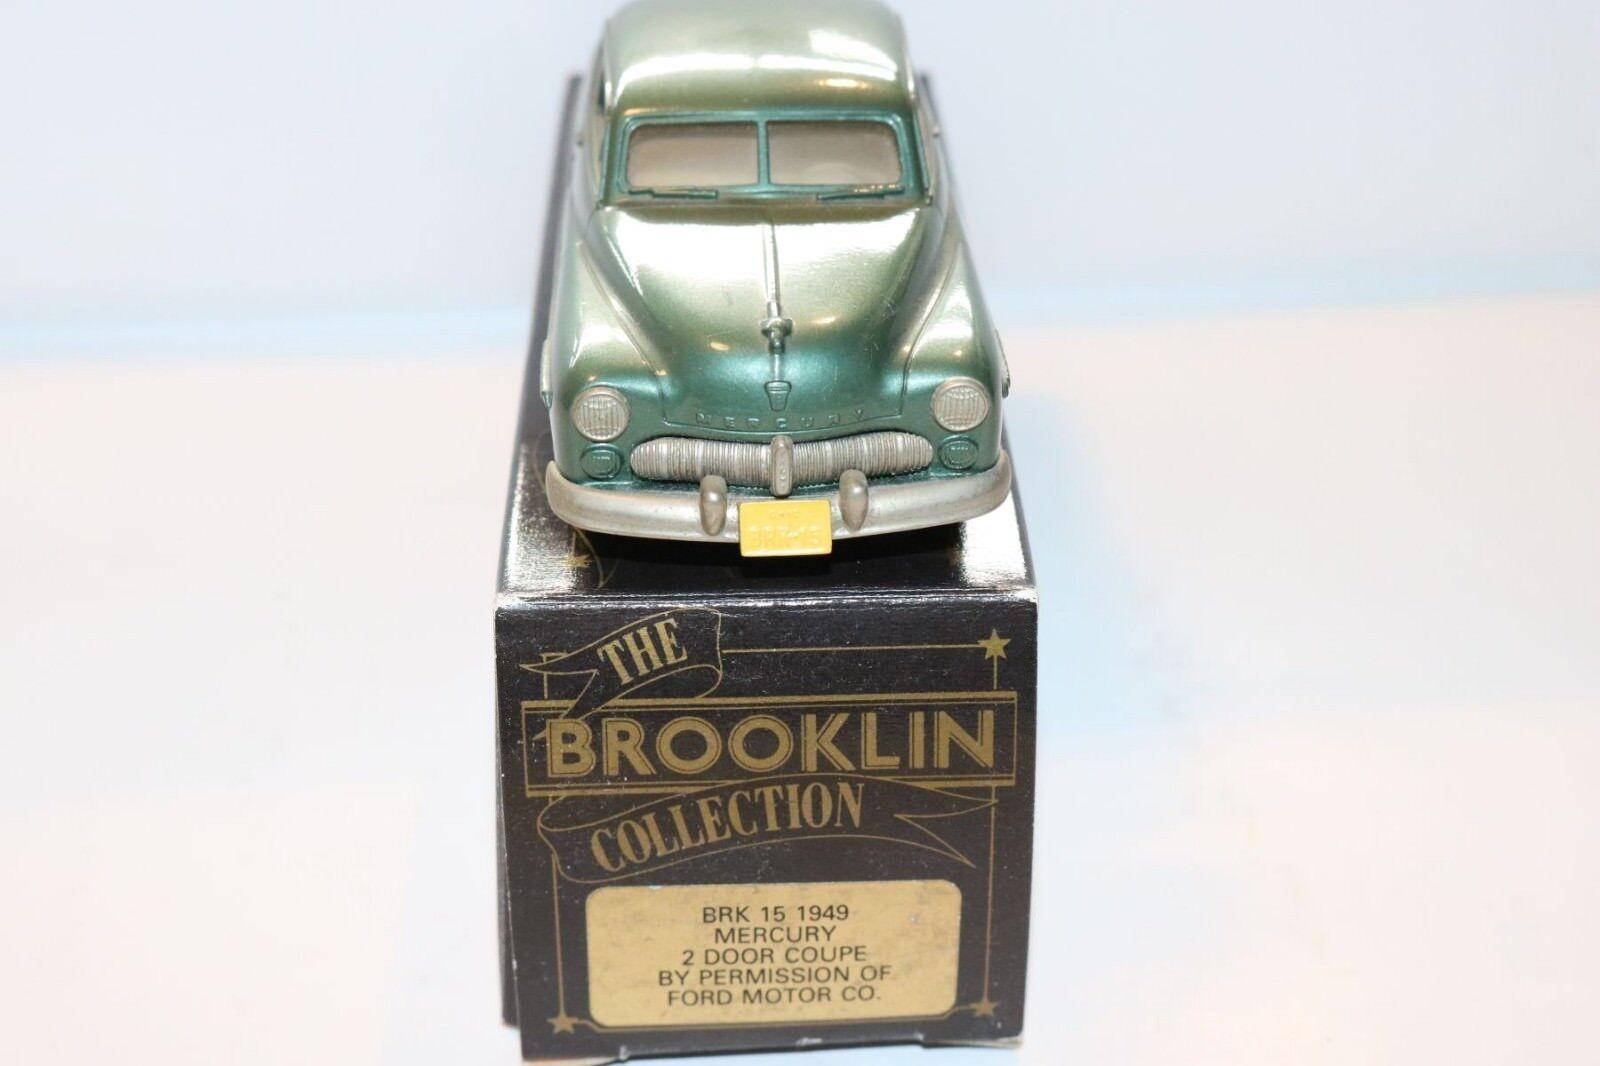 Brooklin Brooklin Brooklin BRK 15 Mercury 2 door coupe 1949 1 43 perfect mint in box 361306